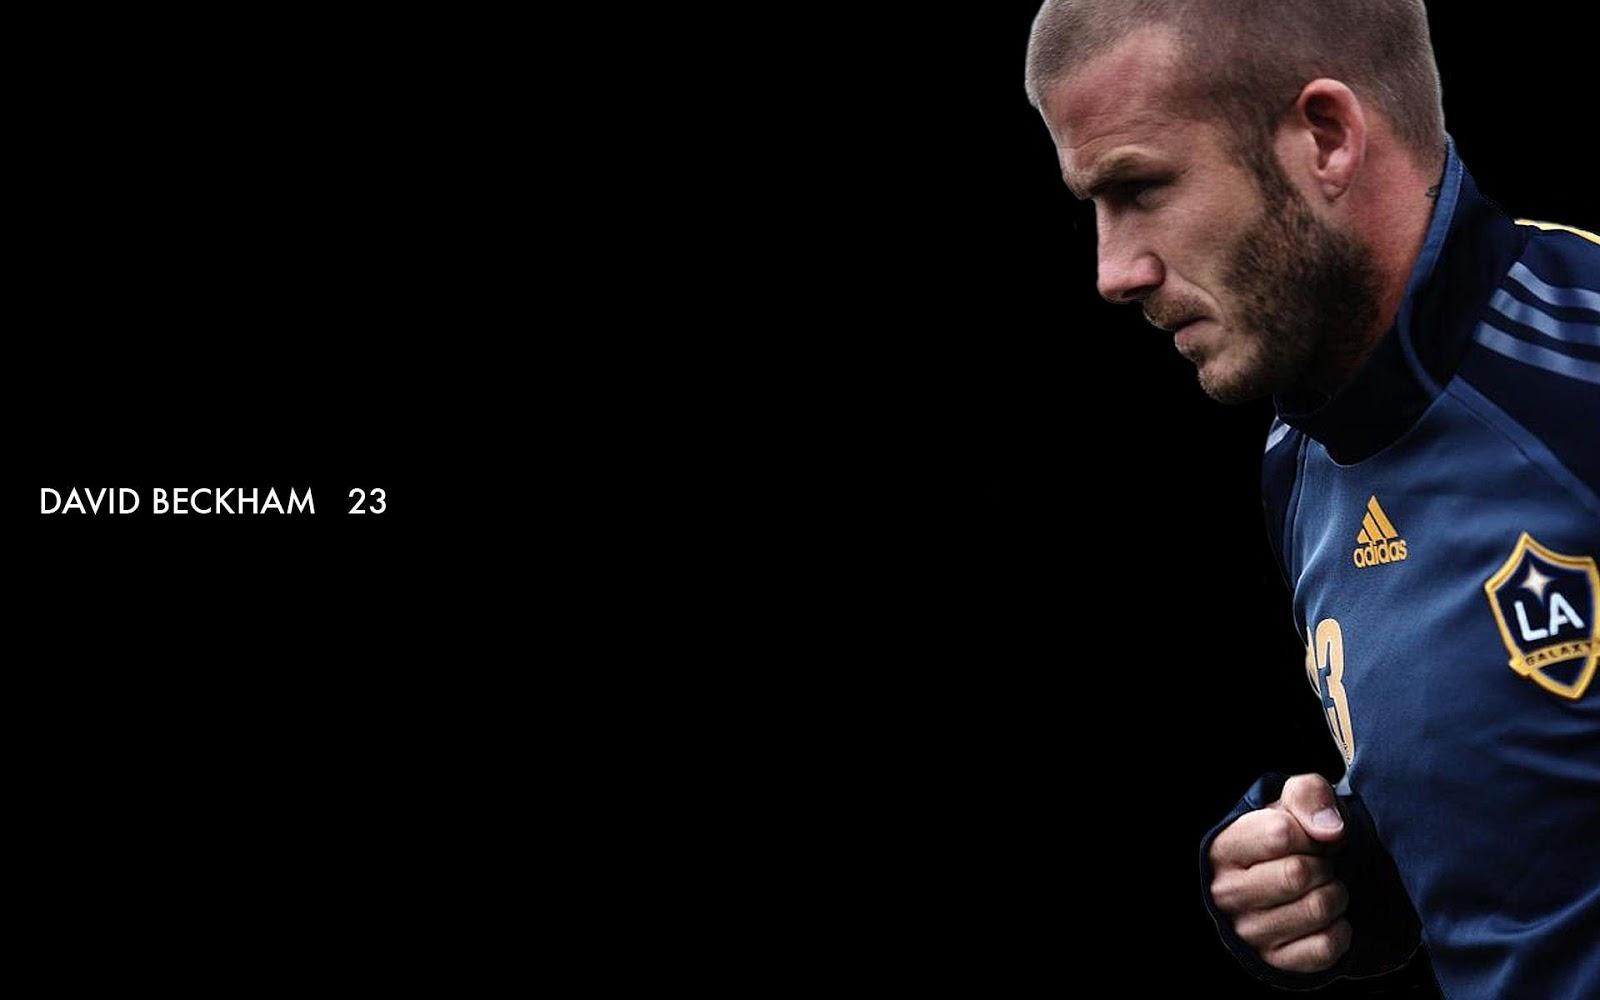 David Beckham L.A. Galaxy NR. 23